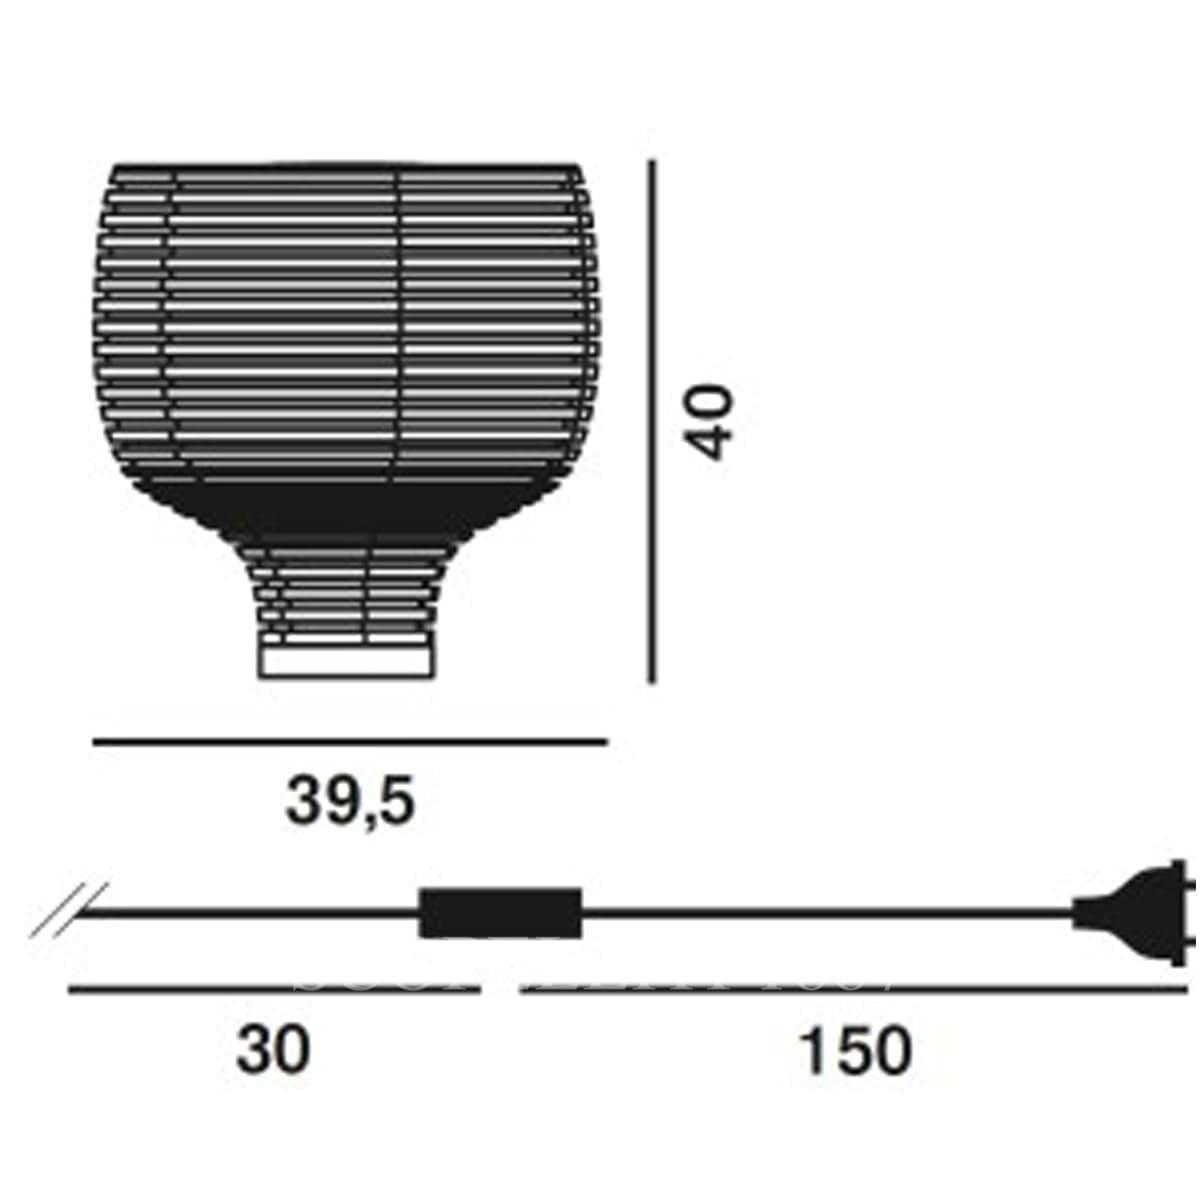 foscarini italian lighting table lamp behive measures